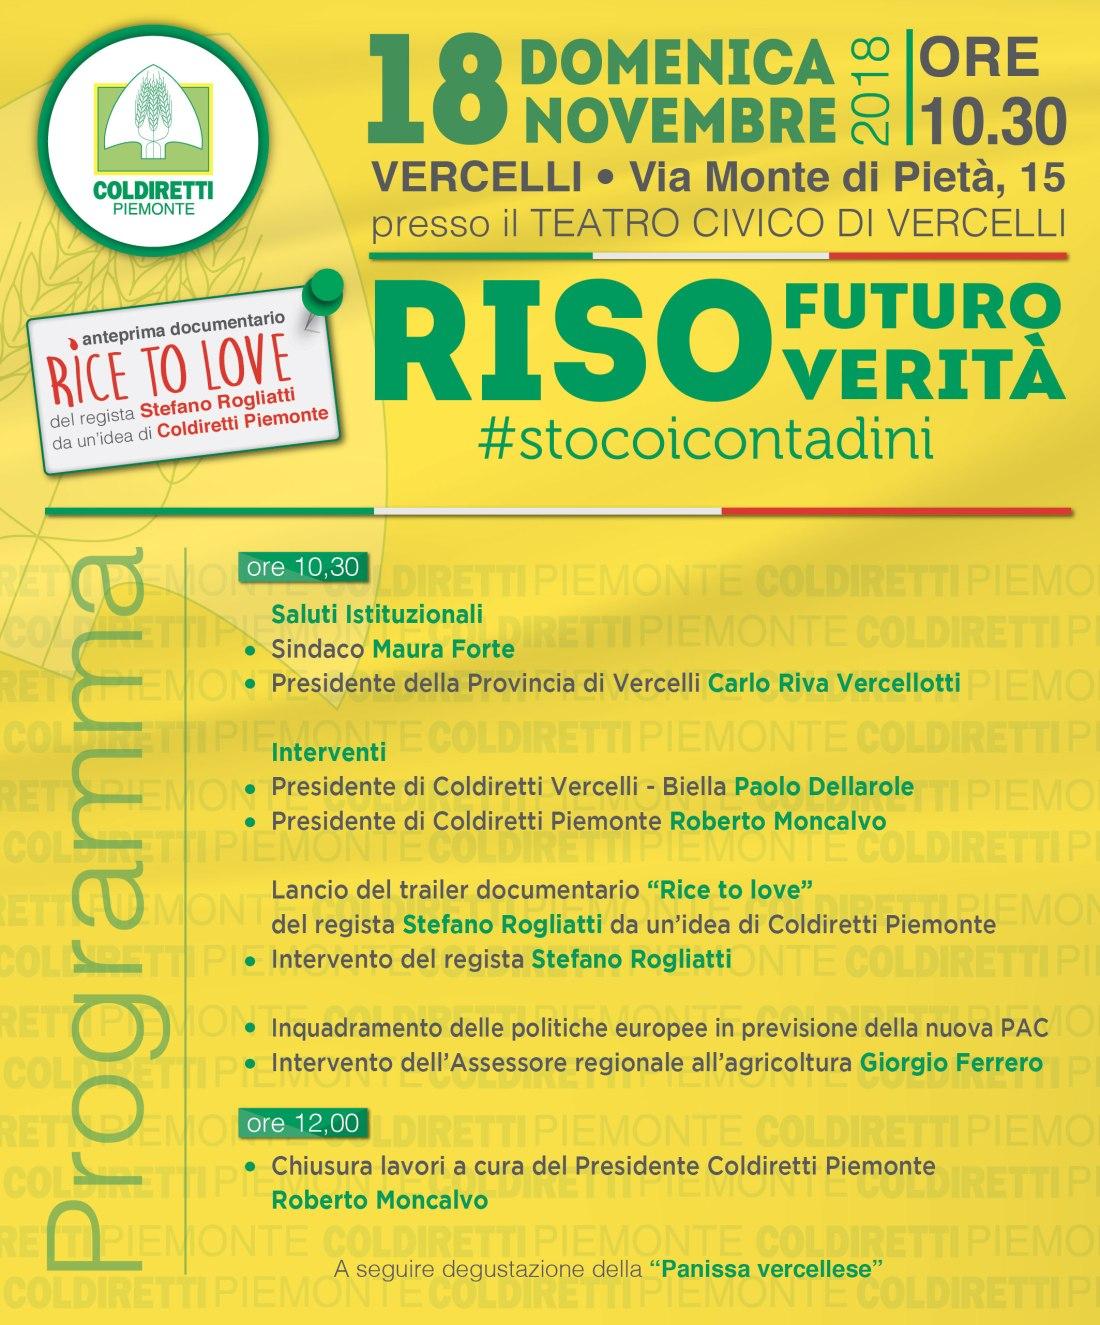 convegno CD-PIEMONTE-Locandina-Vercelli-18_11